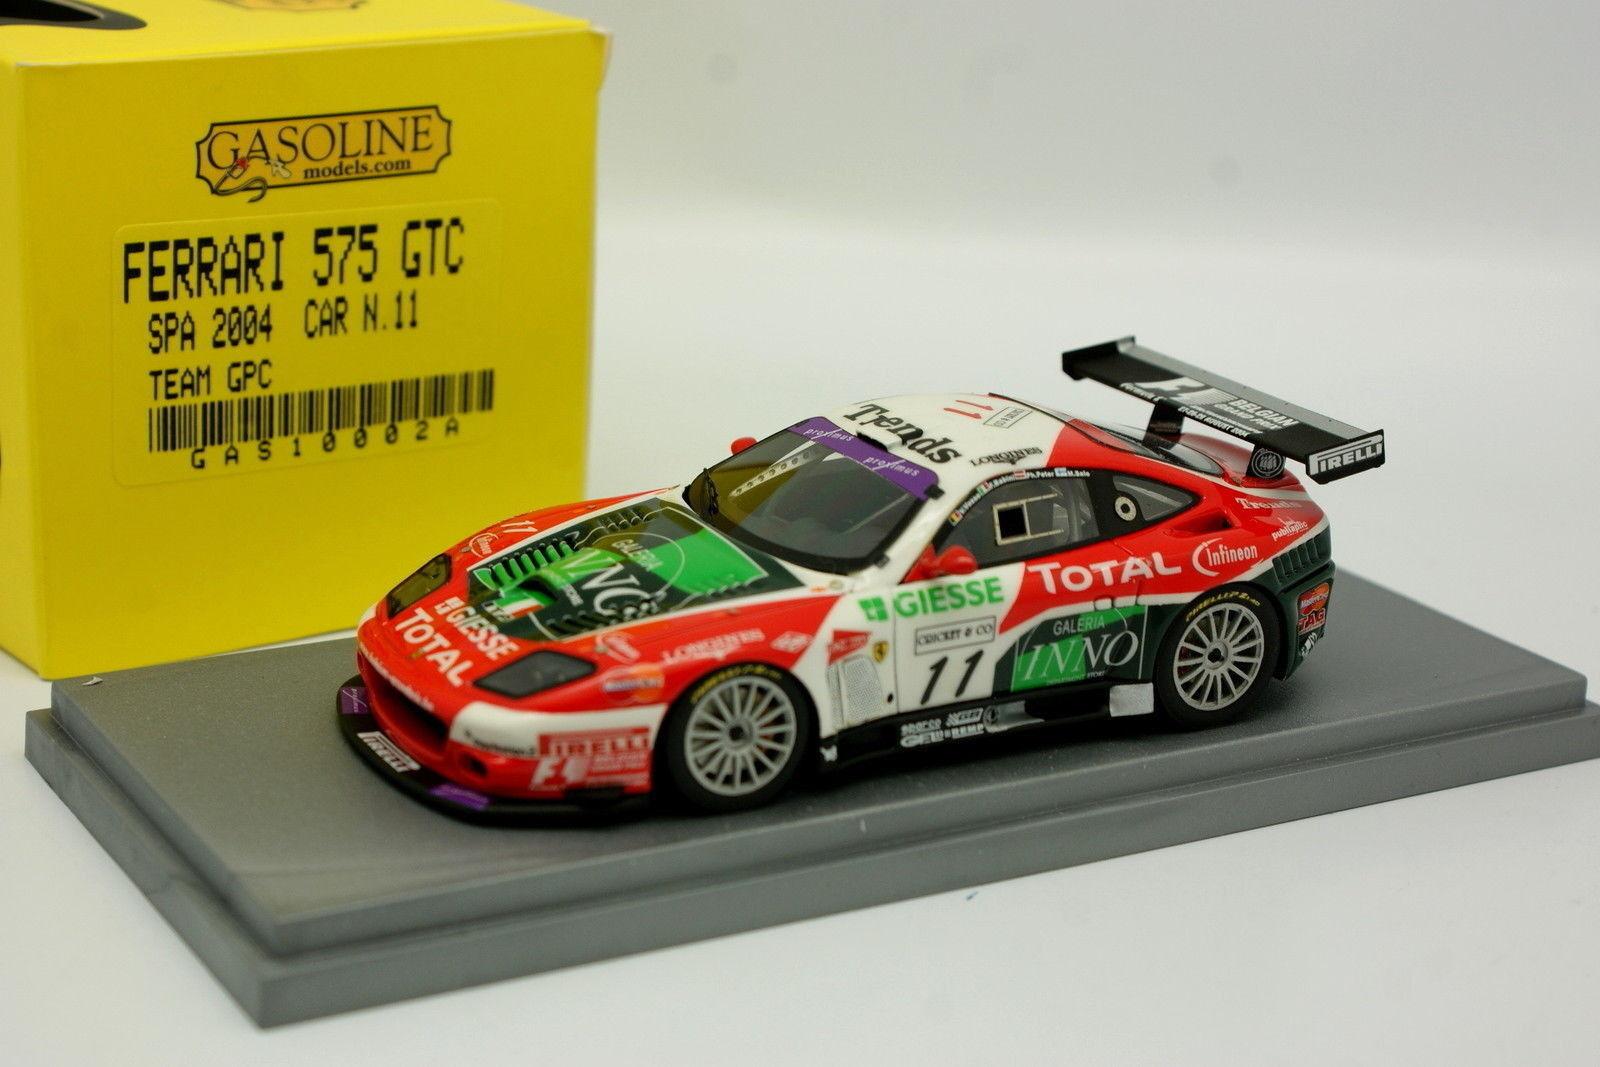 BBR Gasoline 1 43 - Ferrari 575 GTC Spa 2004 GPC N°11